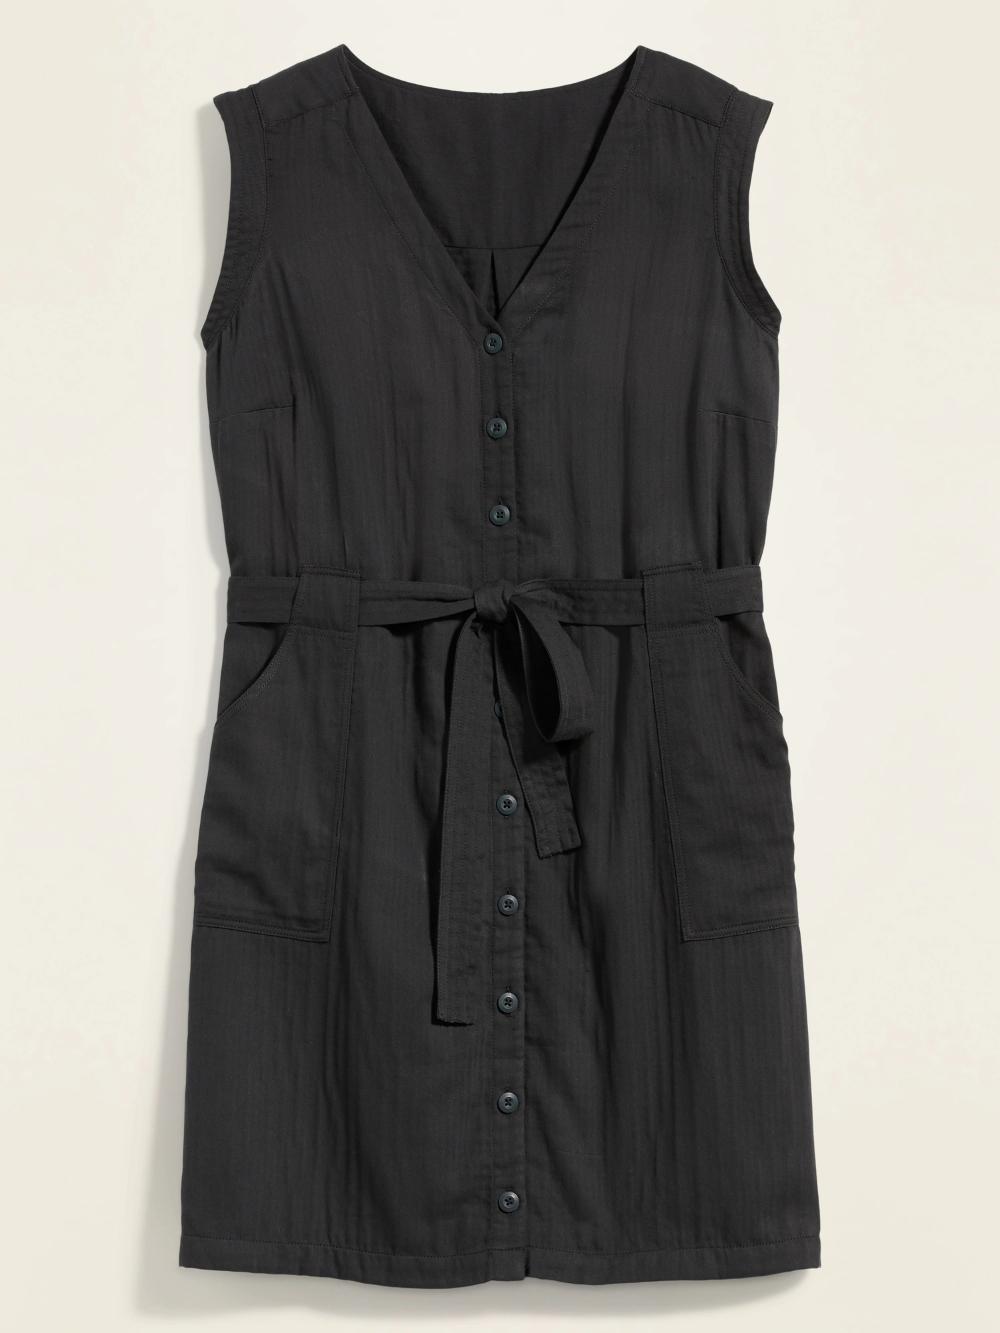 Photo of Button-Front No-Peek Tie-Belt Plus-Size Sleeveless Utility Dress